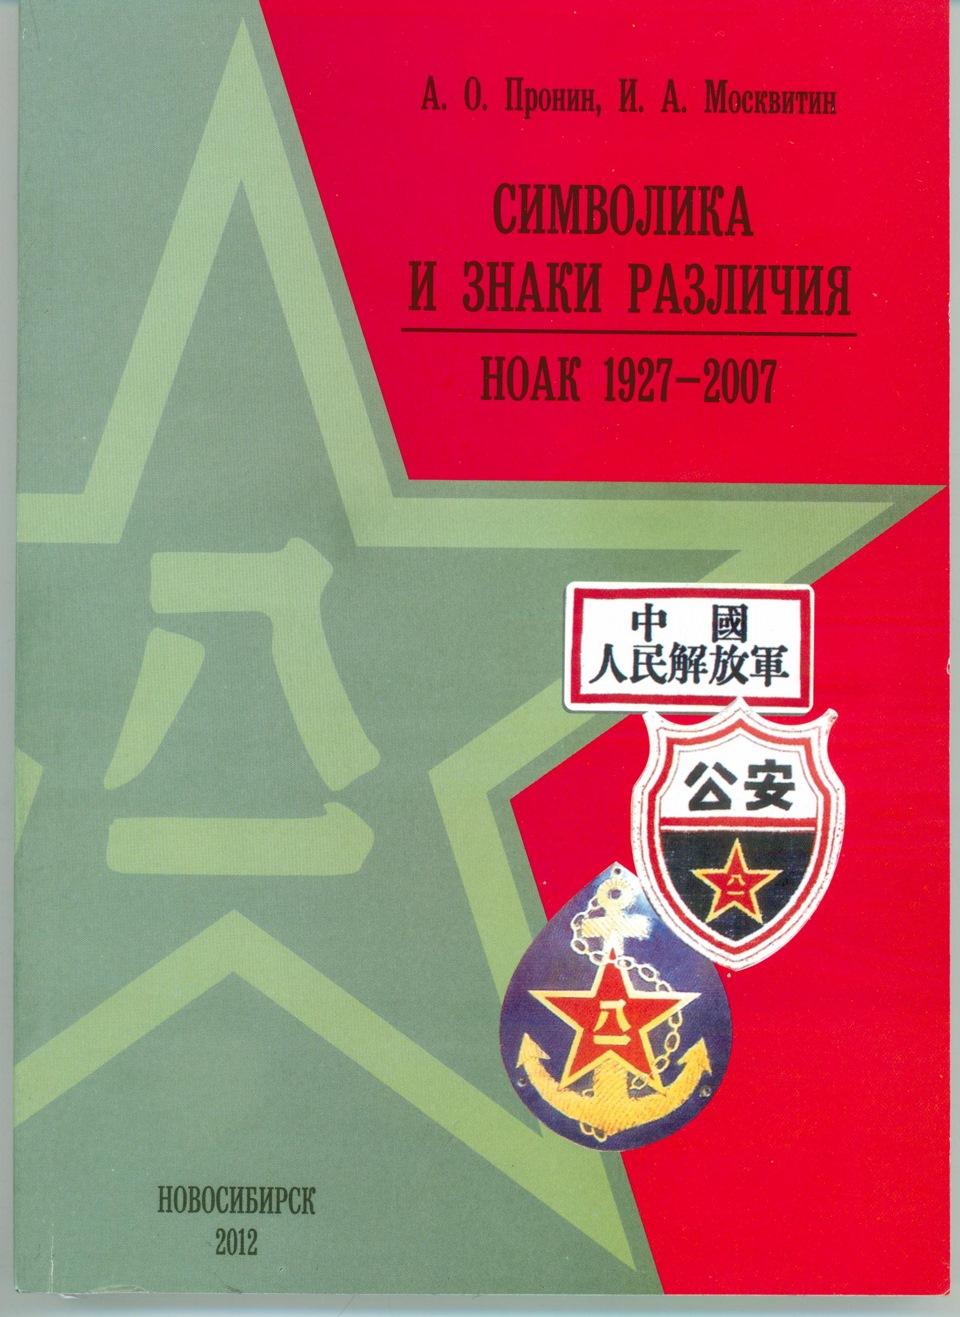 Знаки различия и символика ноак 1927 2007